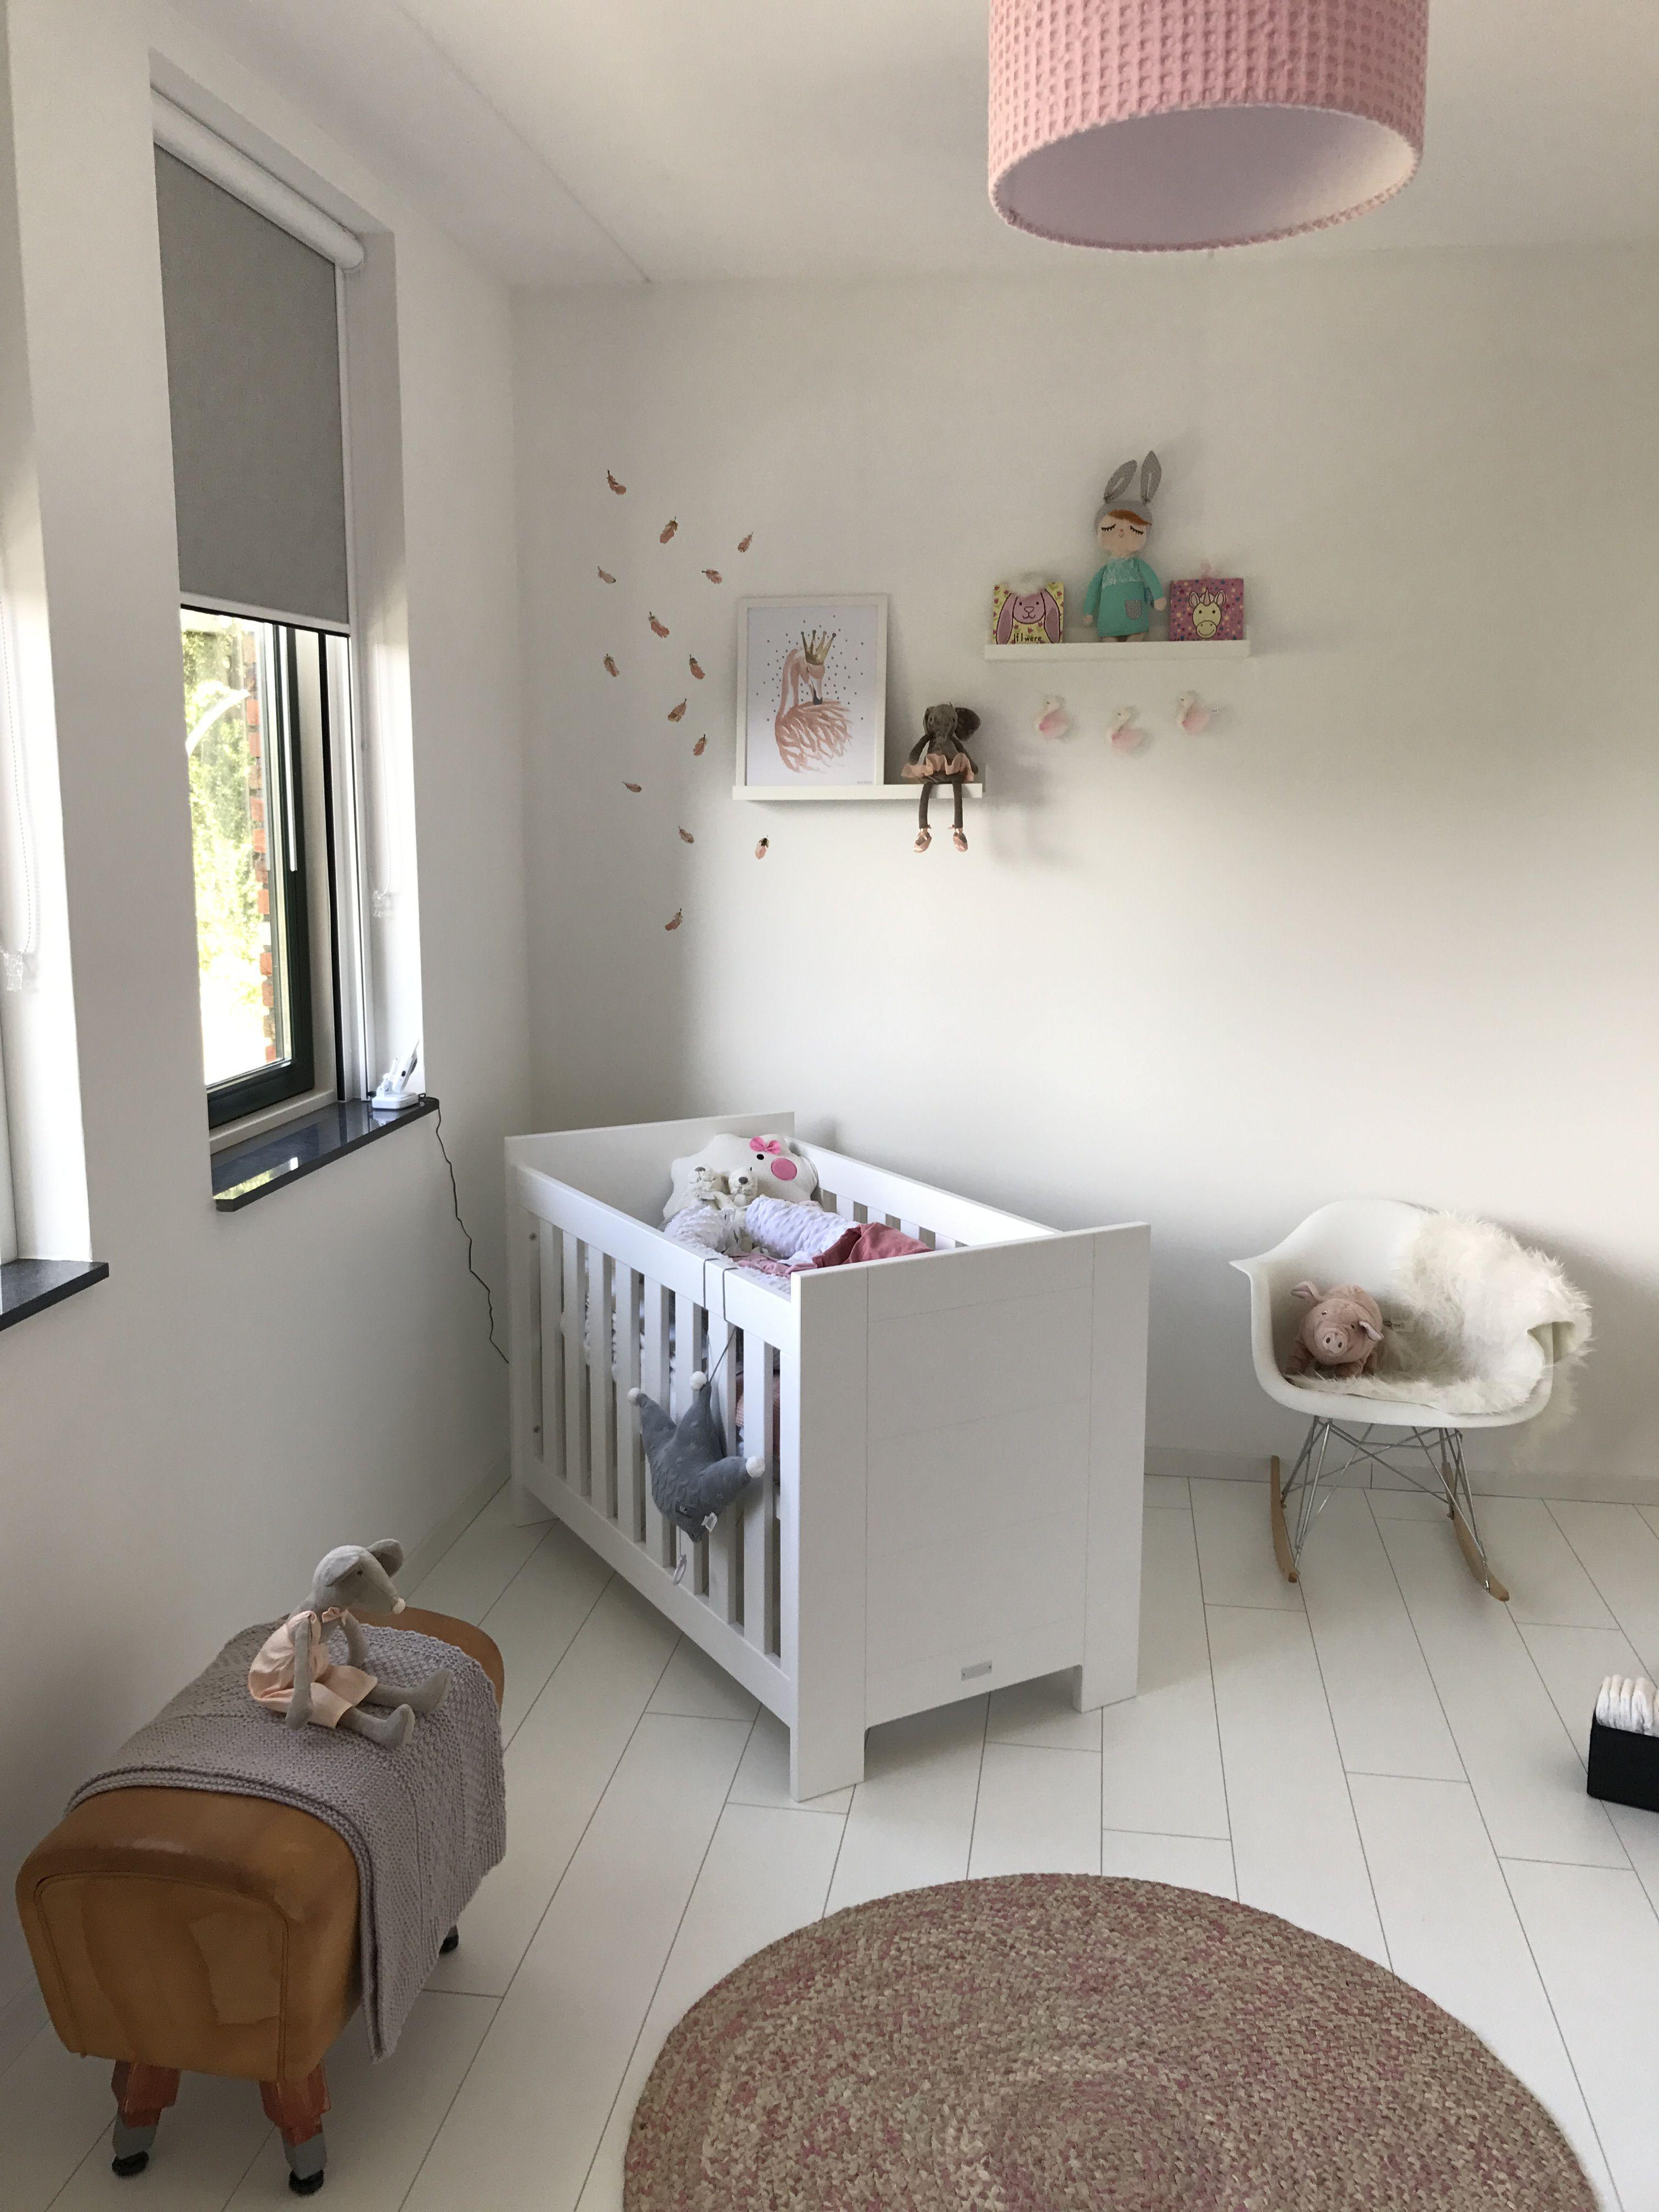 Eames Schommelstoel Babykamer.Eames Babykamer Zeer Mooie Vintage Leuk Voor Babykamer Eames